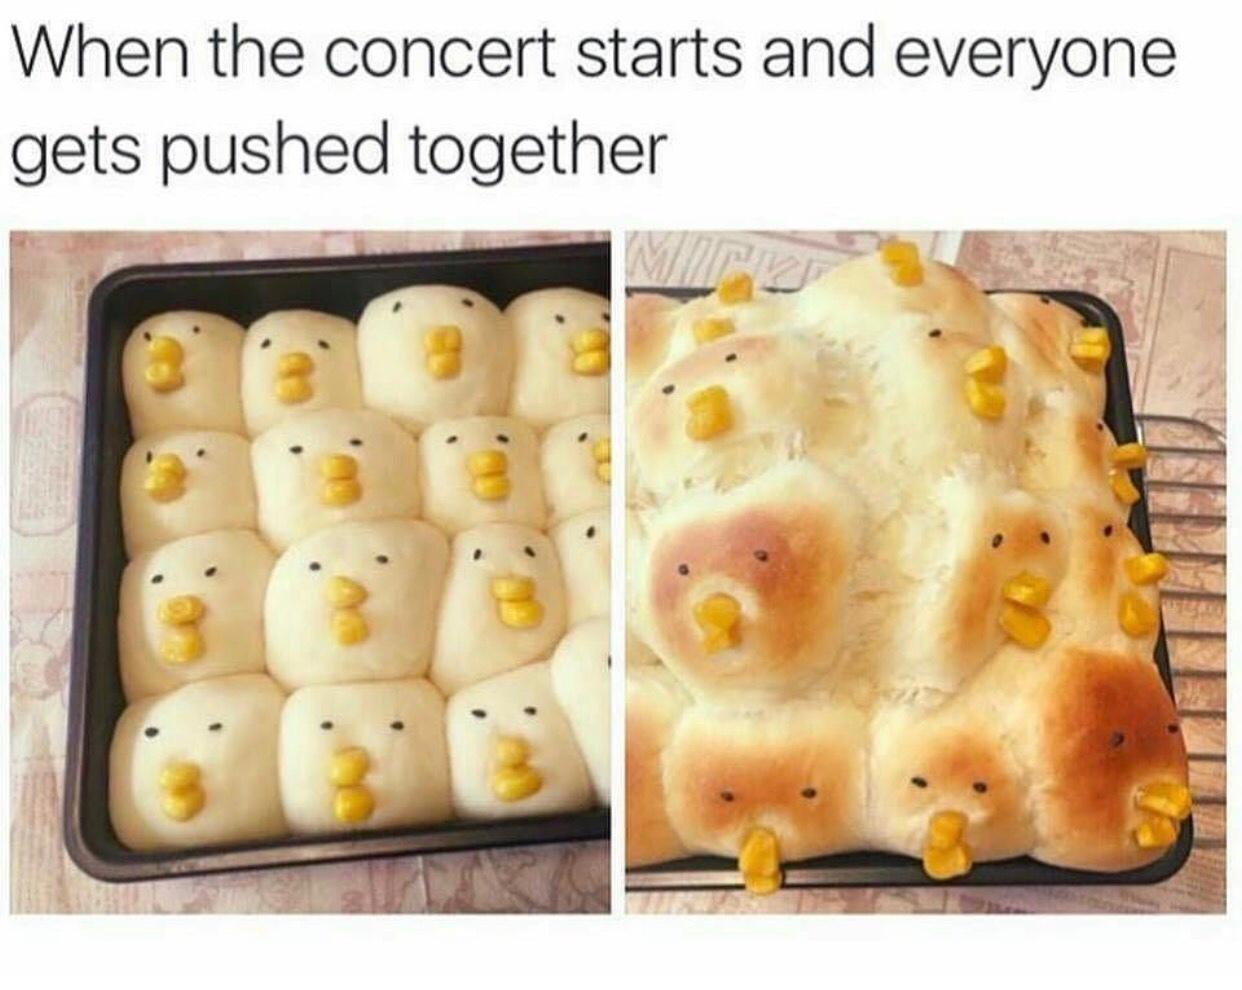 metal concerts - meme